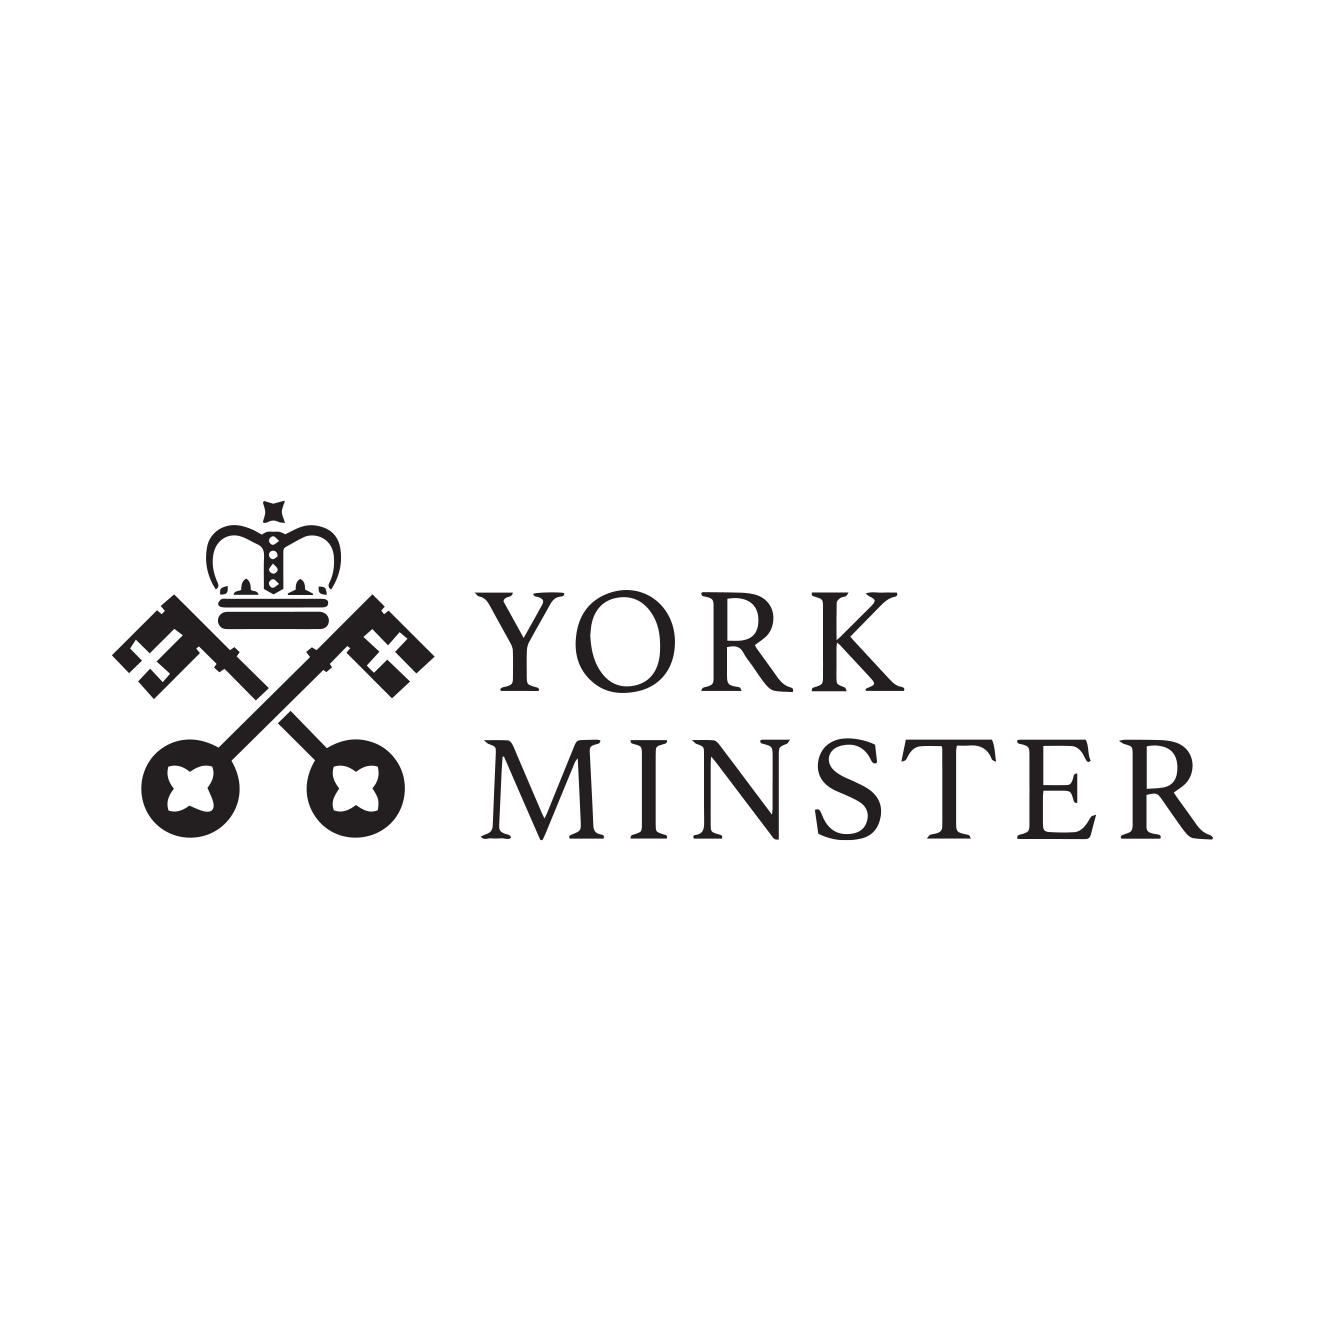 Yorkminster.png